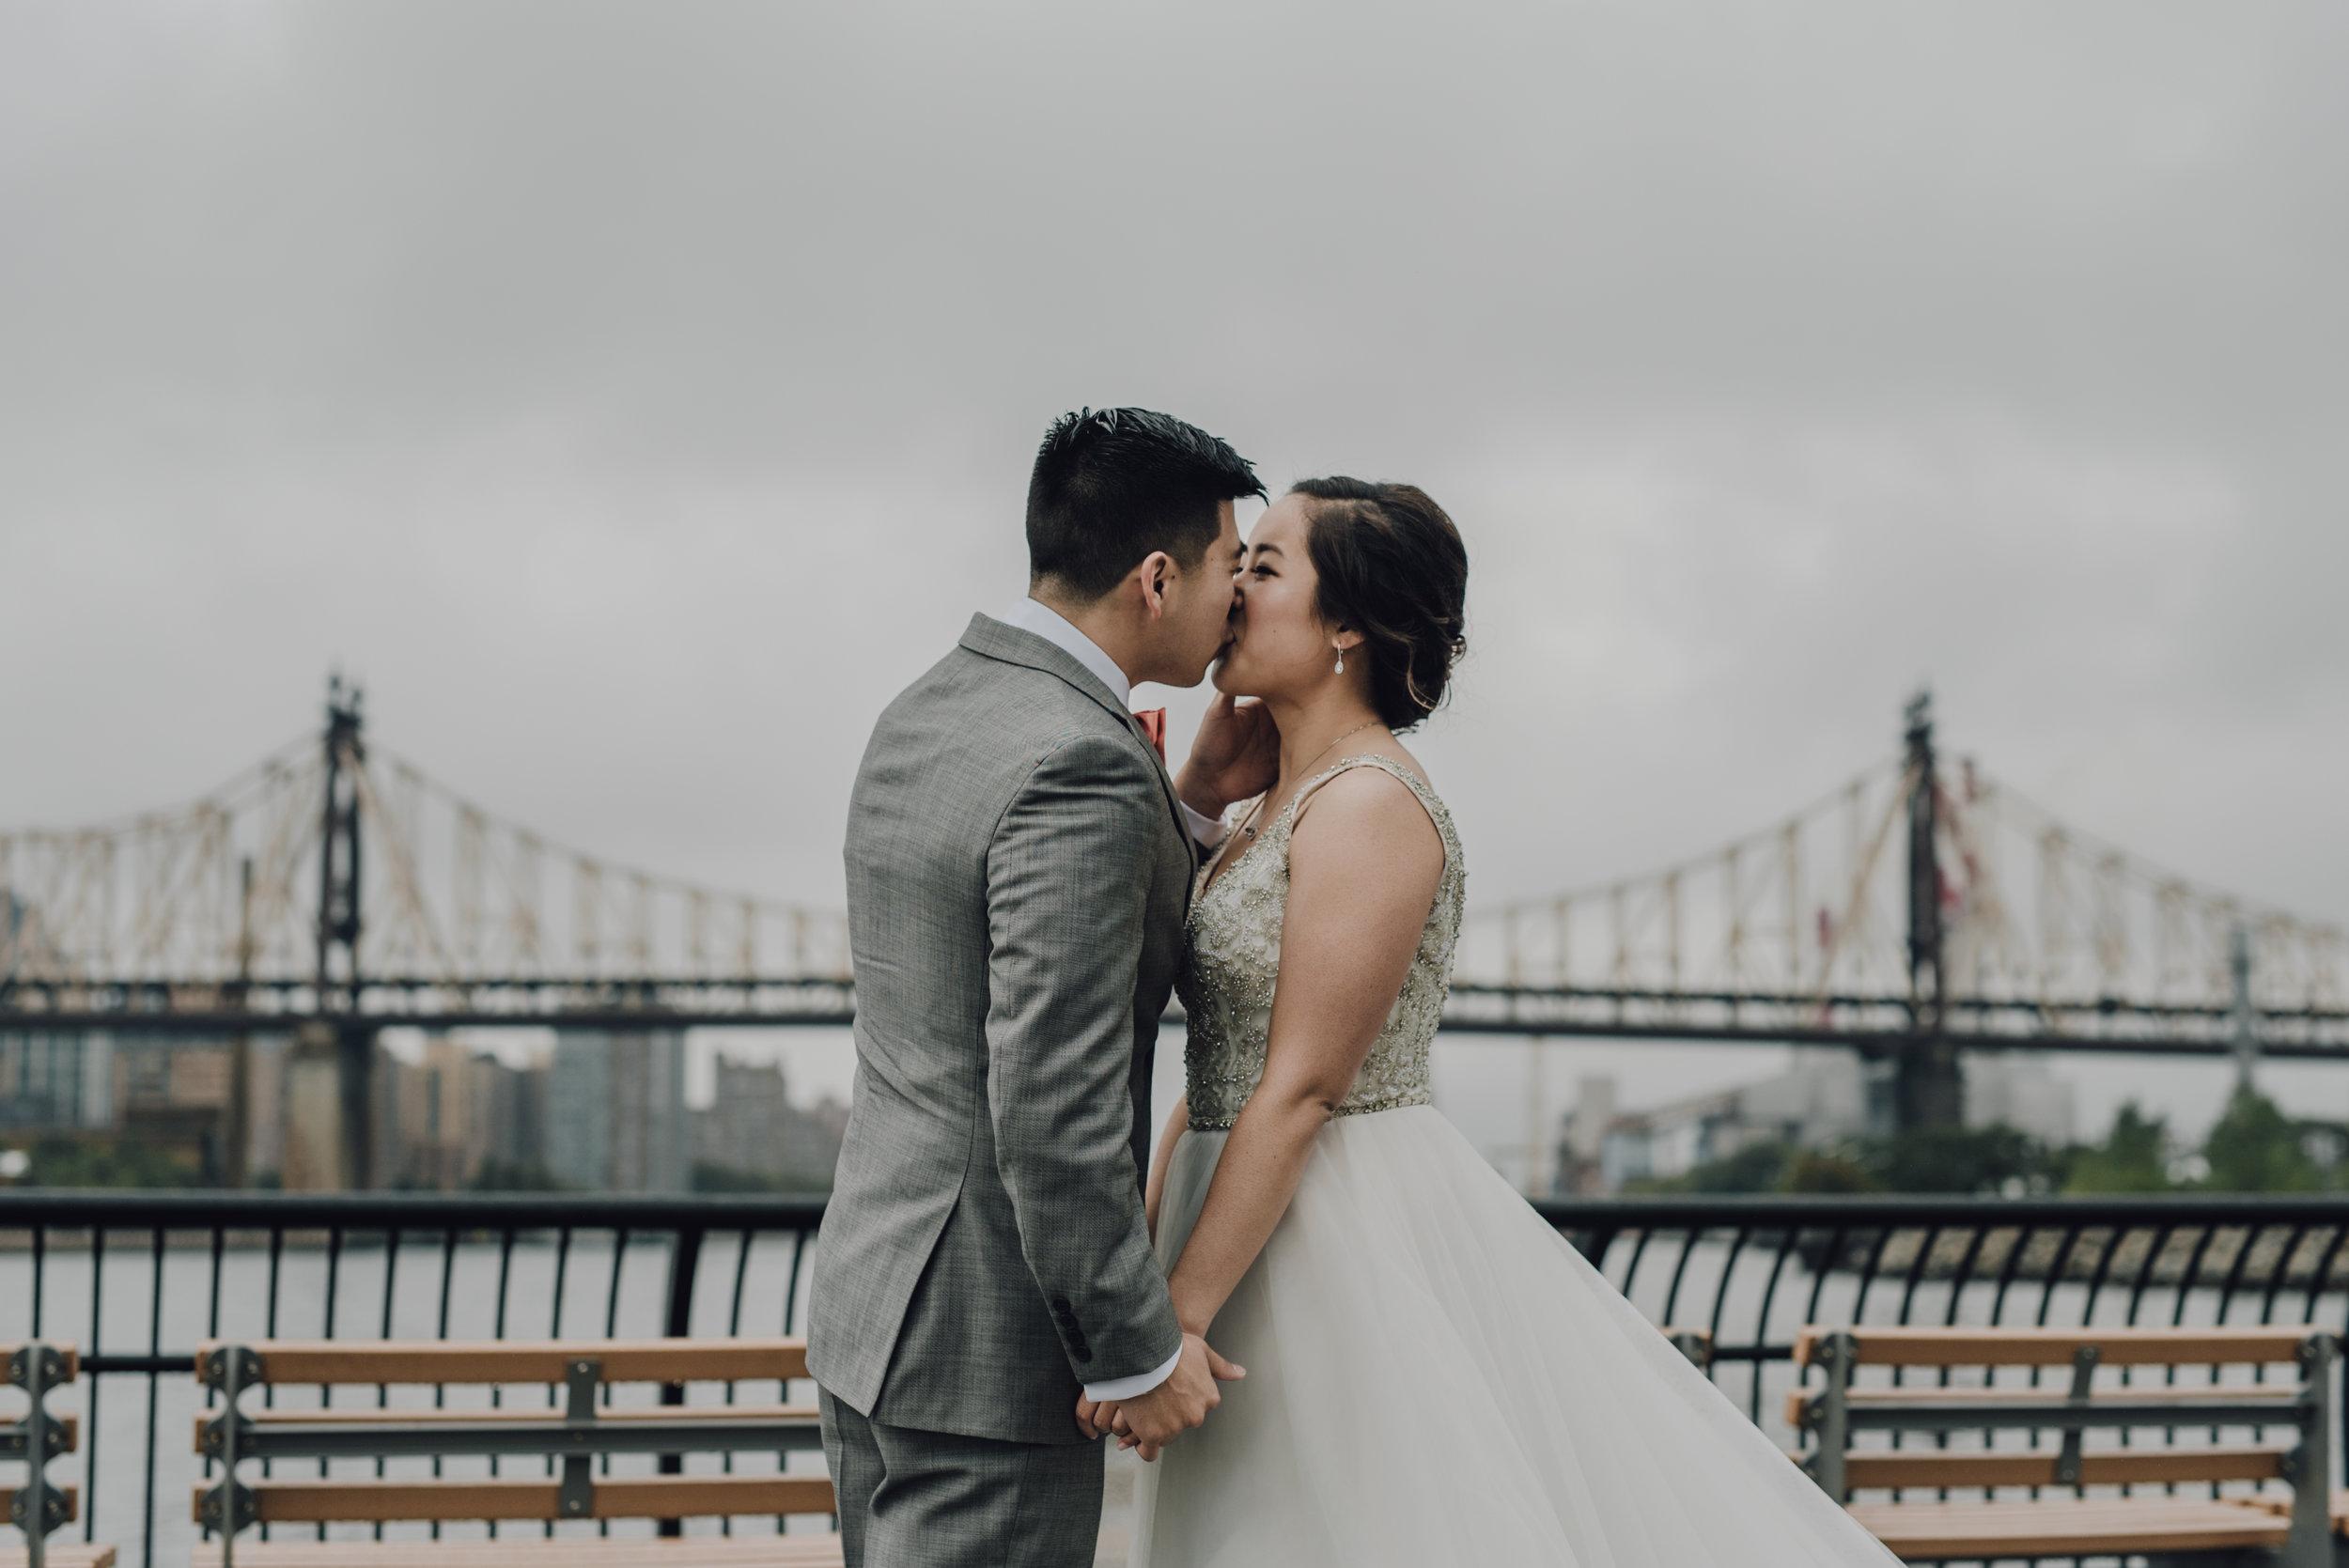 Main and Simple Photography_2017_Weddings_NewYork_TinaJon-359.jpg